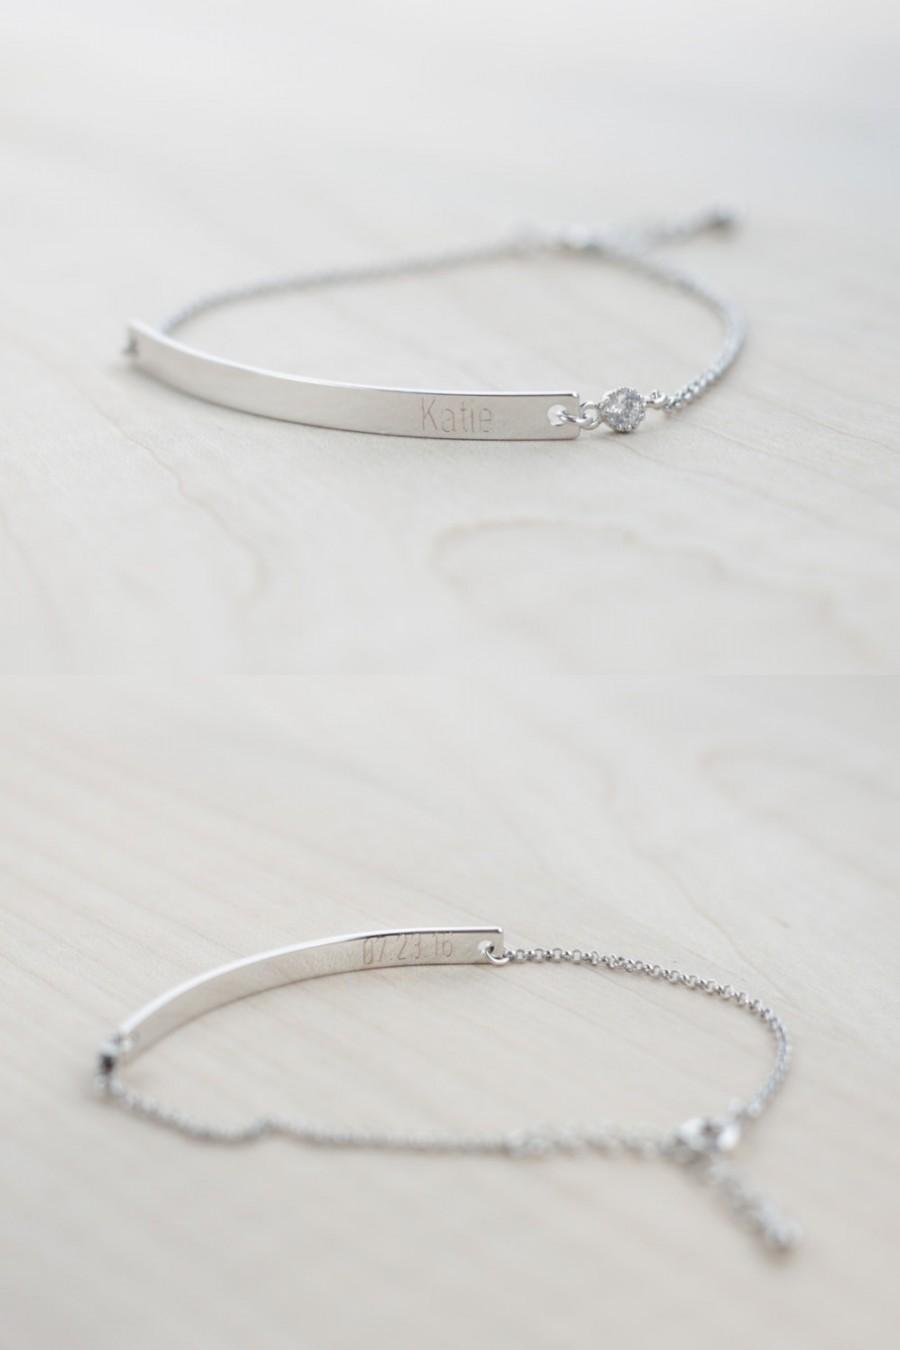 زفاف - Bridesmaid Jewelry - Will you be my bridesmaid? - Bridesmaid Proposal (Silver Bar Bracelet with CZ)